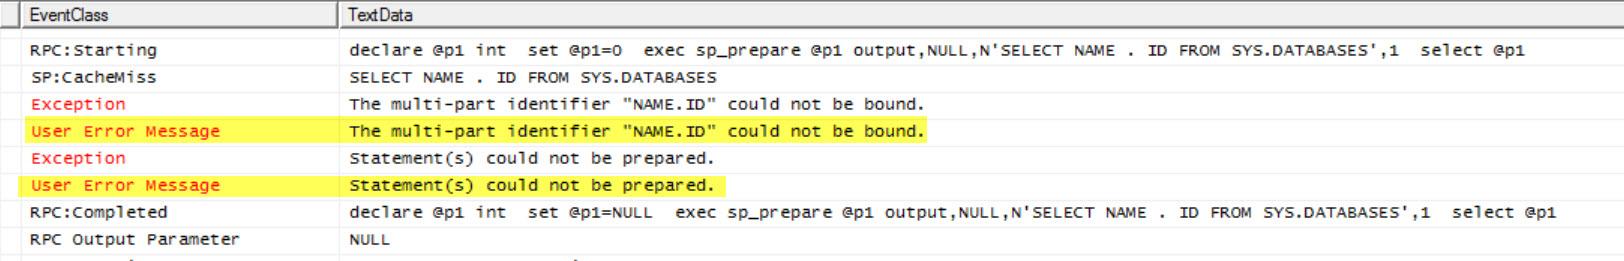 SQL SERVER - FIX: Msg 8180 - Statement(s) Could not be Prepared. Deferred Prepare Could not be Completed linked-stmt-prep-02